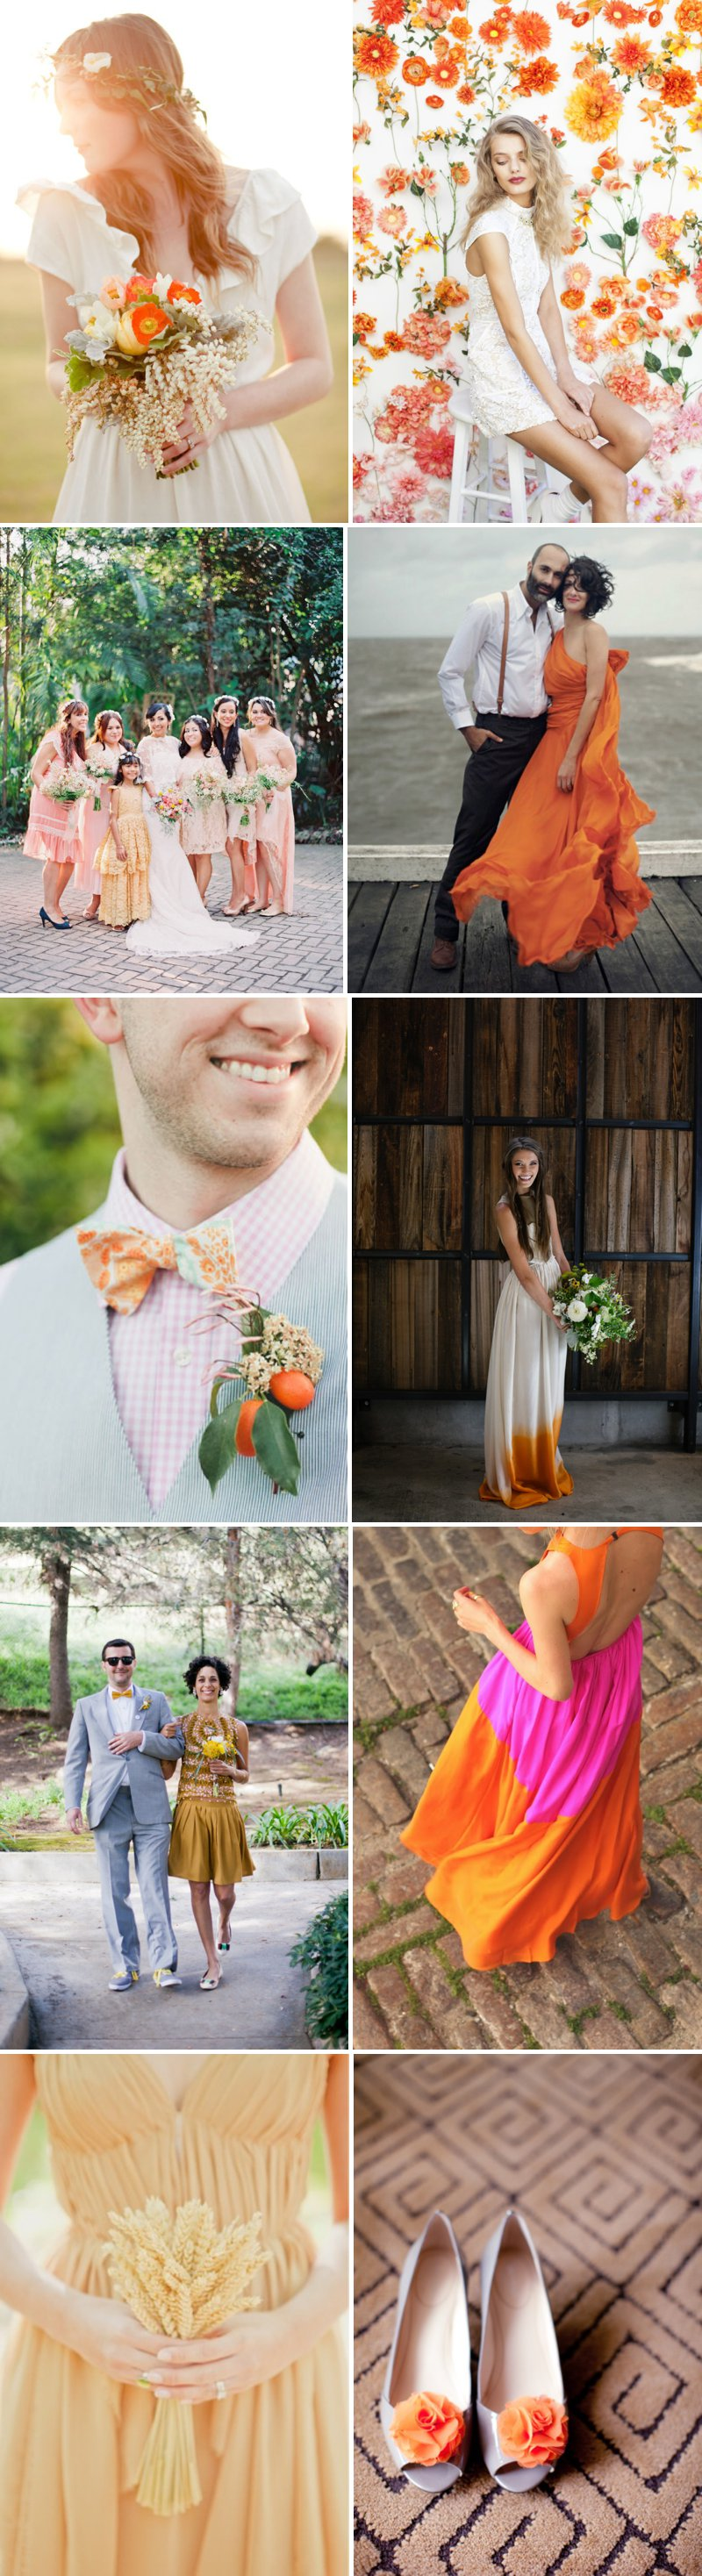 Grapefruit Girls Orange Wedding Outfit Dress